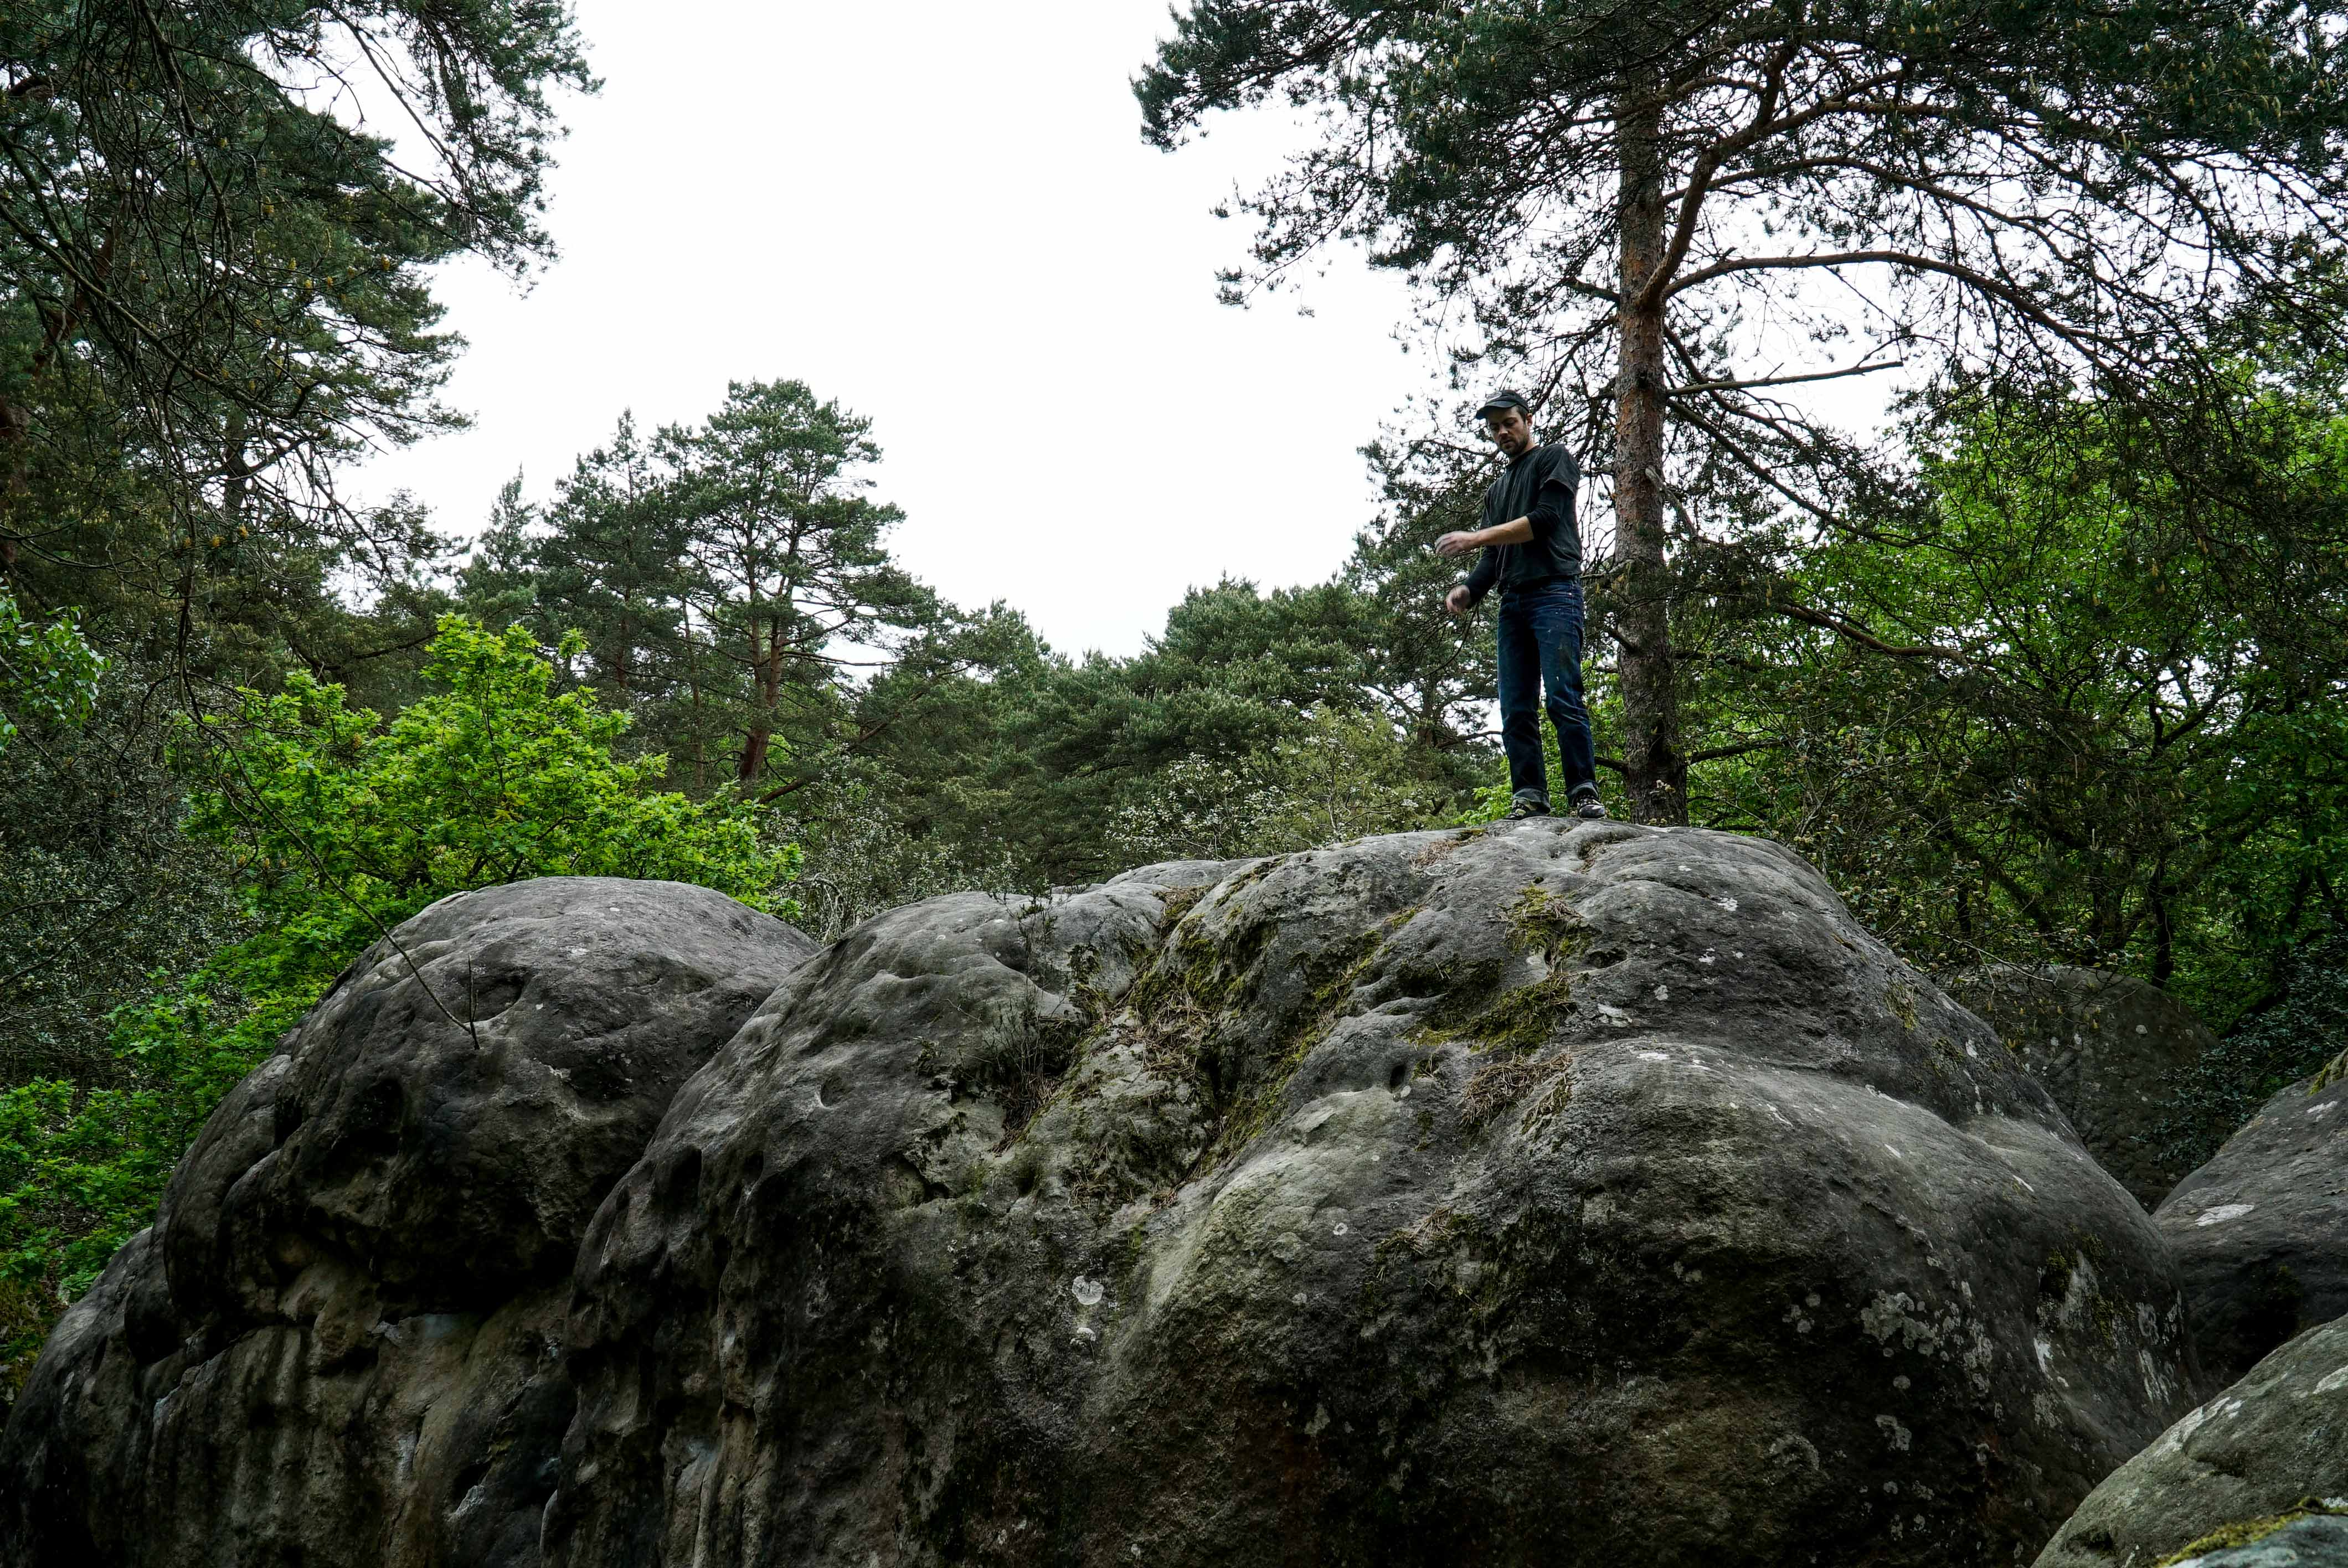 fontainbleau climbing 2016 mike brindley-122